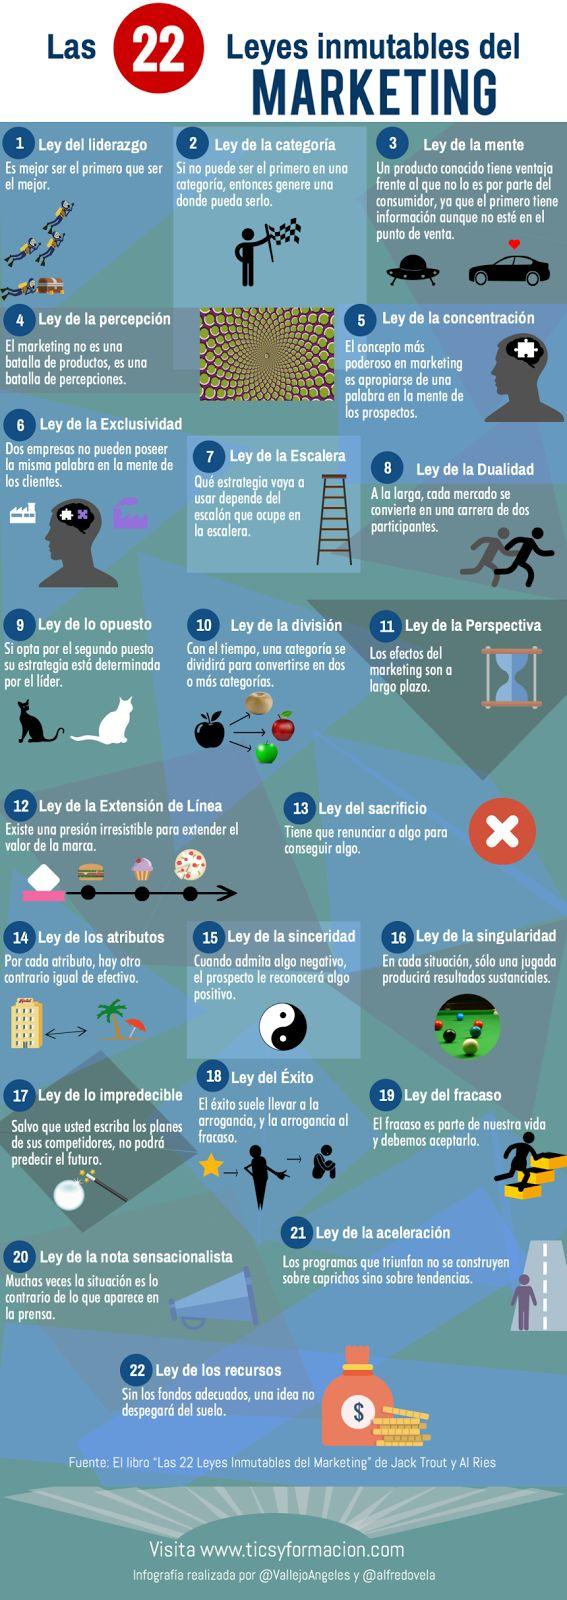 Las 22 Leyes inmutables del Marketing #Infografia #Infographic #Mercadotecnia